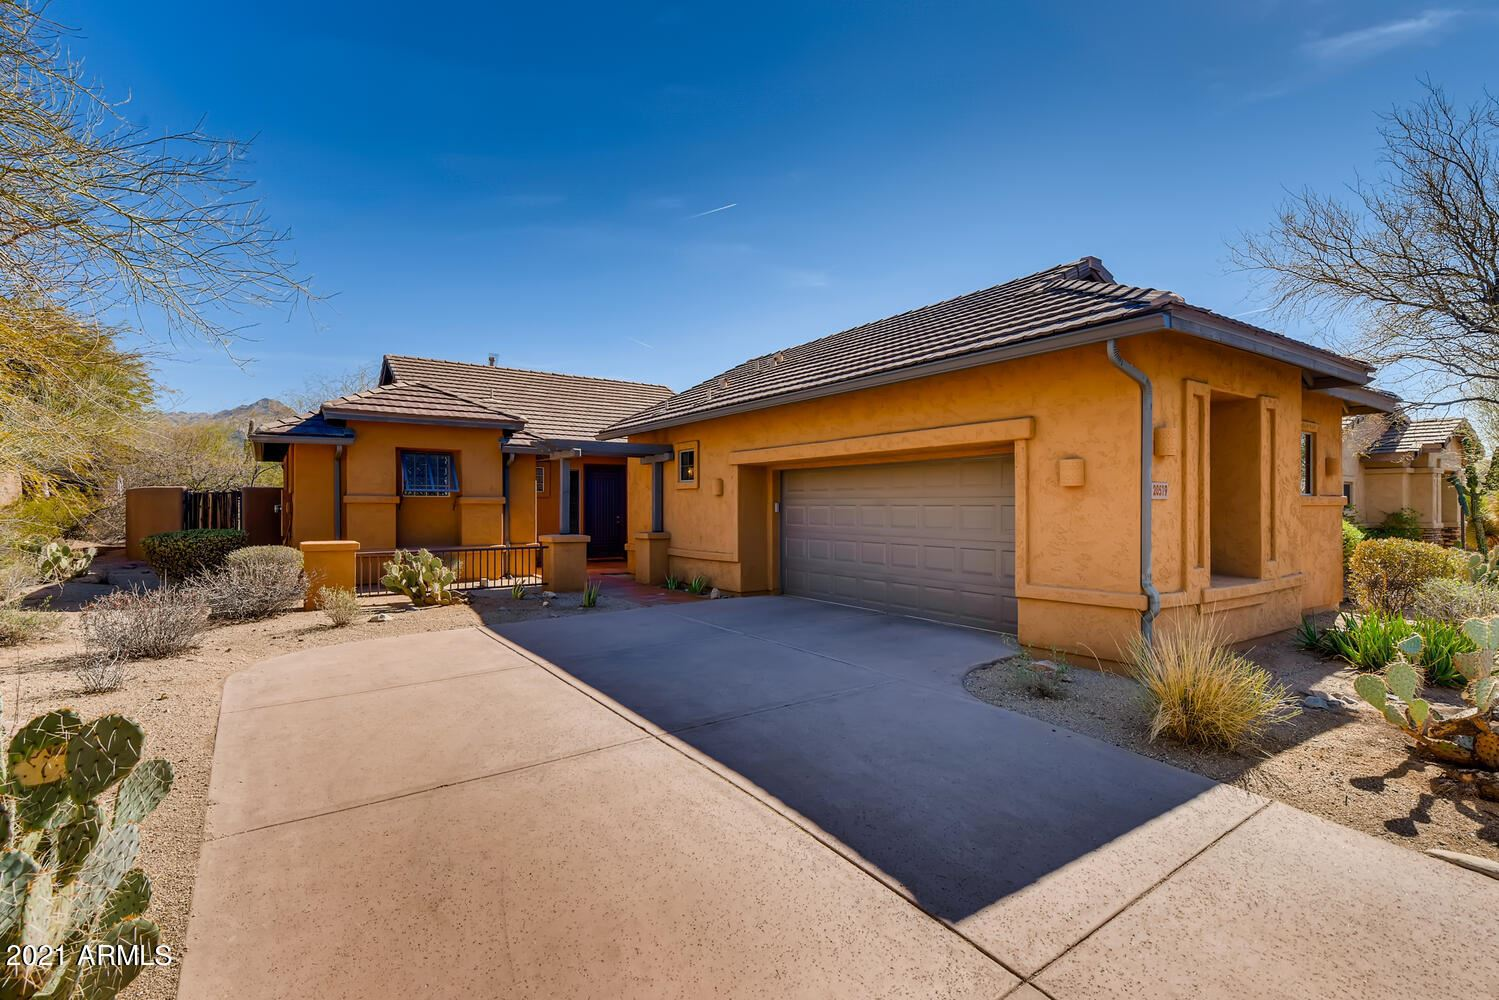 Photo of 20519 N 95TH Street, Scottsdale, AZ 85255 (MLS # 6189520)